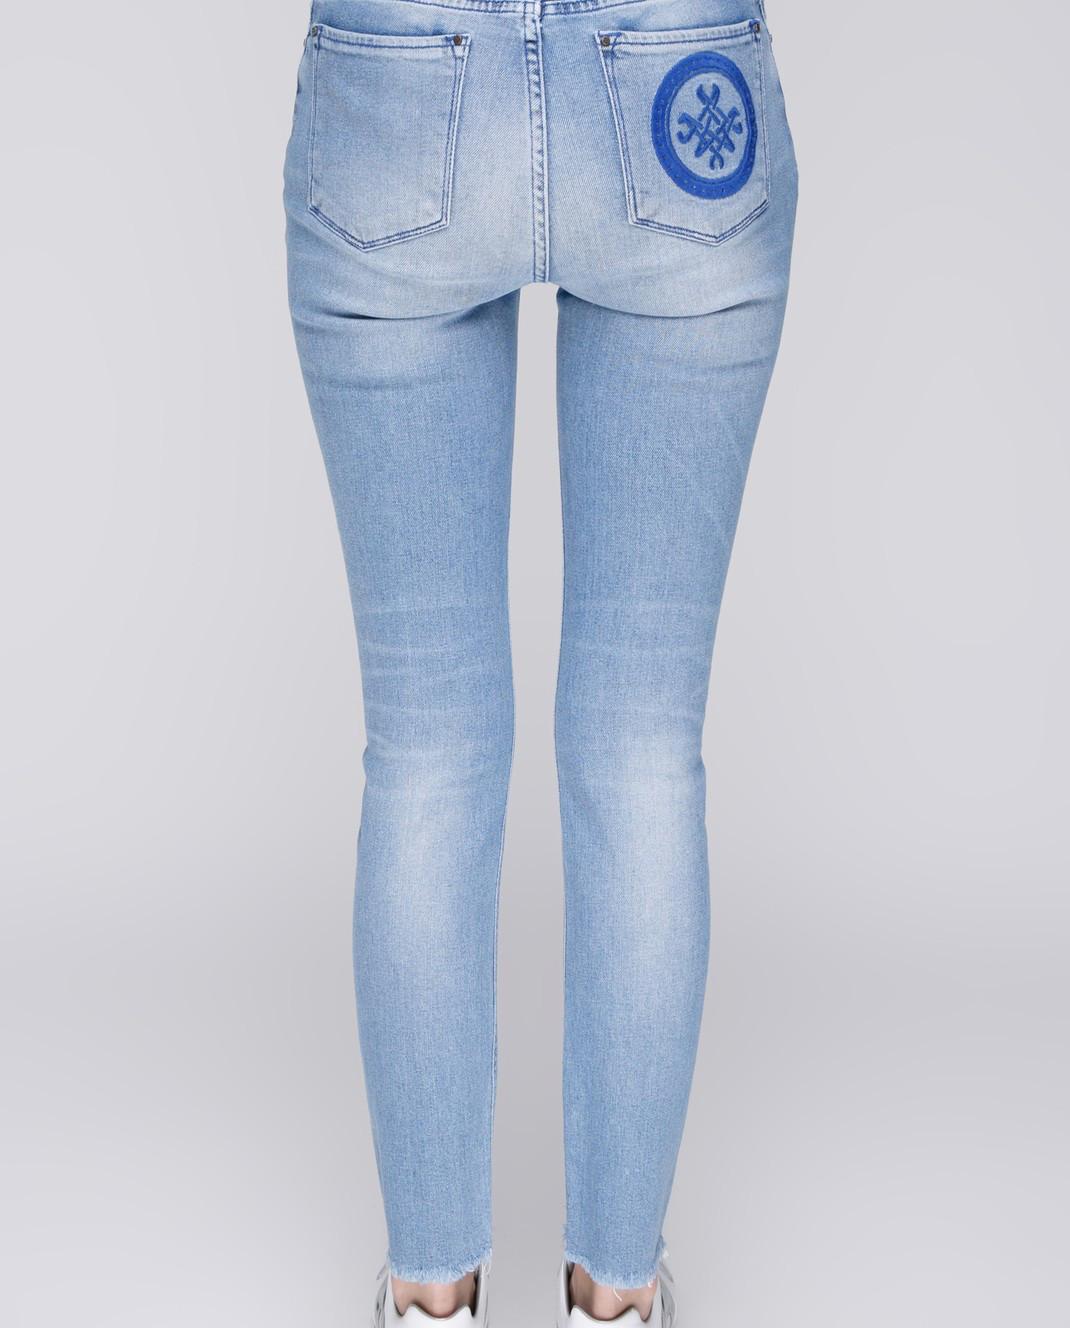 Mr&Mrs Italy Голубые джинсы JE040 изображение 4